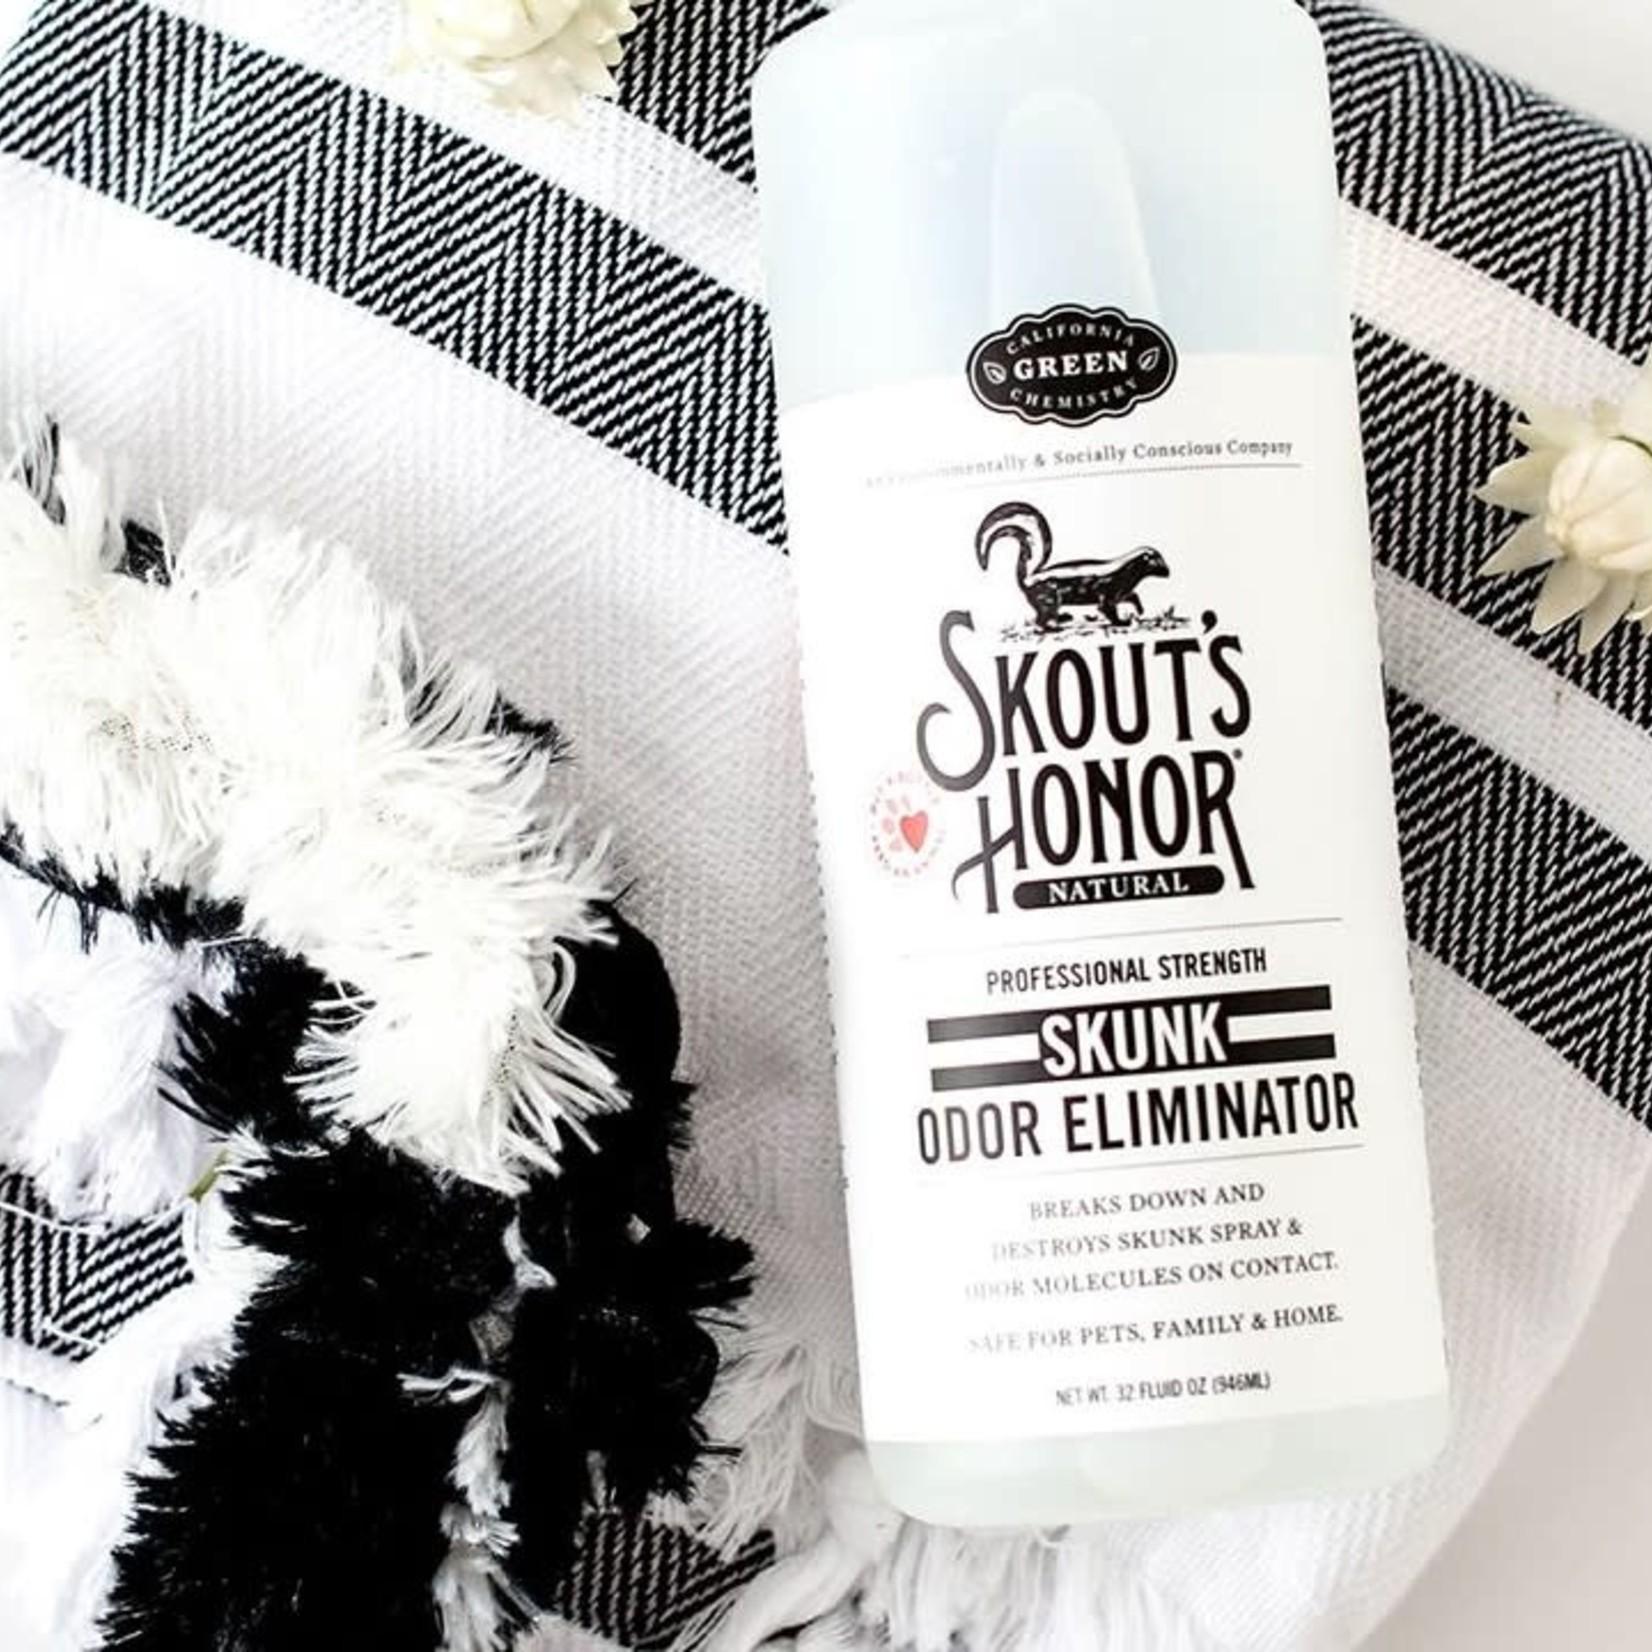 Skouts Honor Skouts Honor Skunk Odor Eliminator 32 OZ